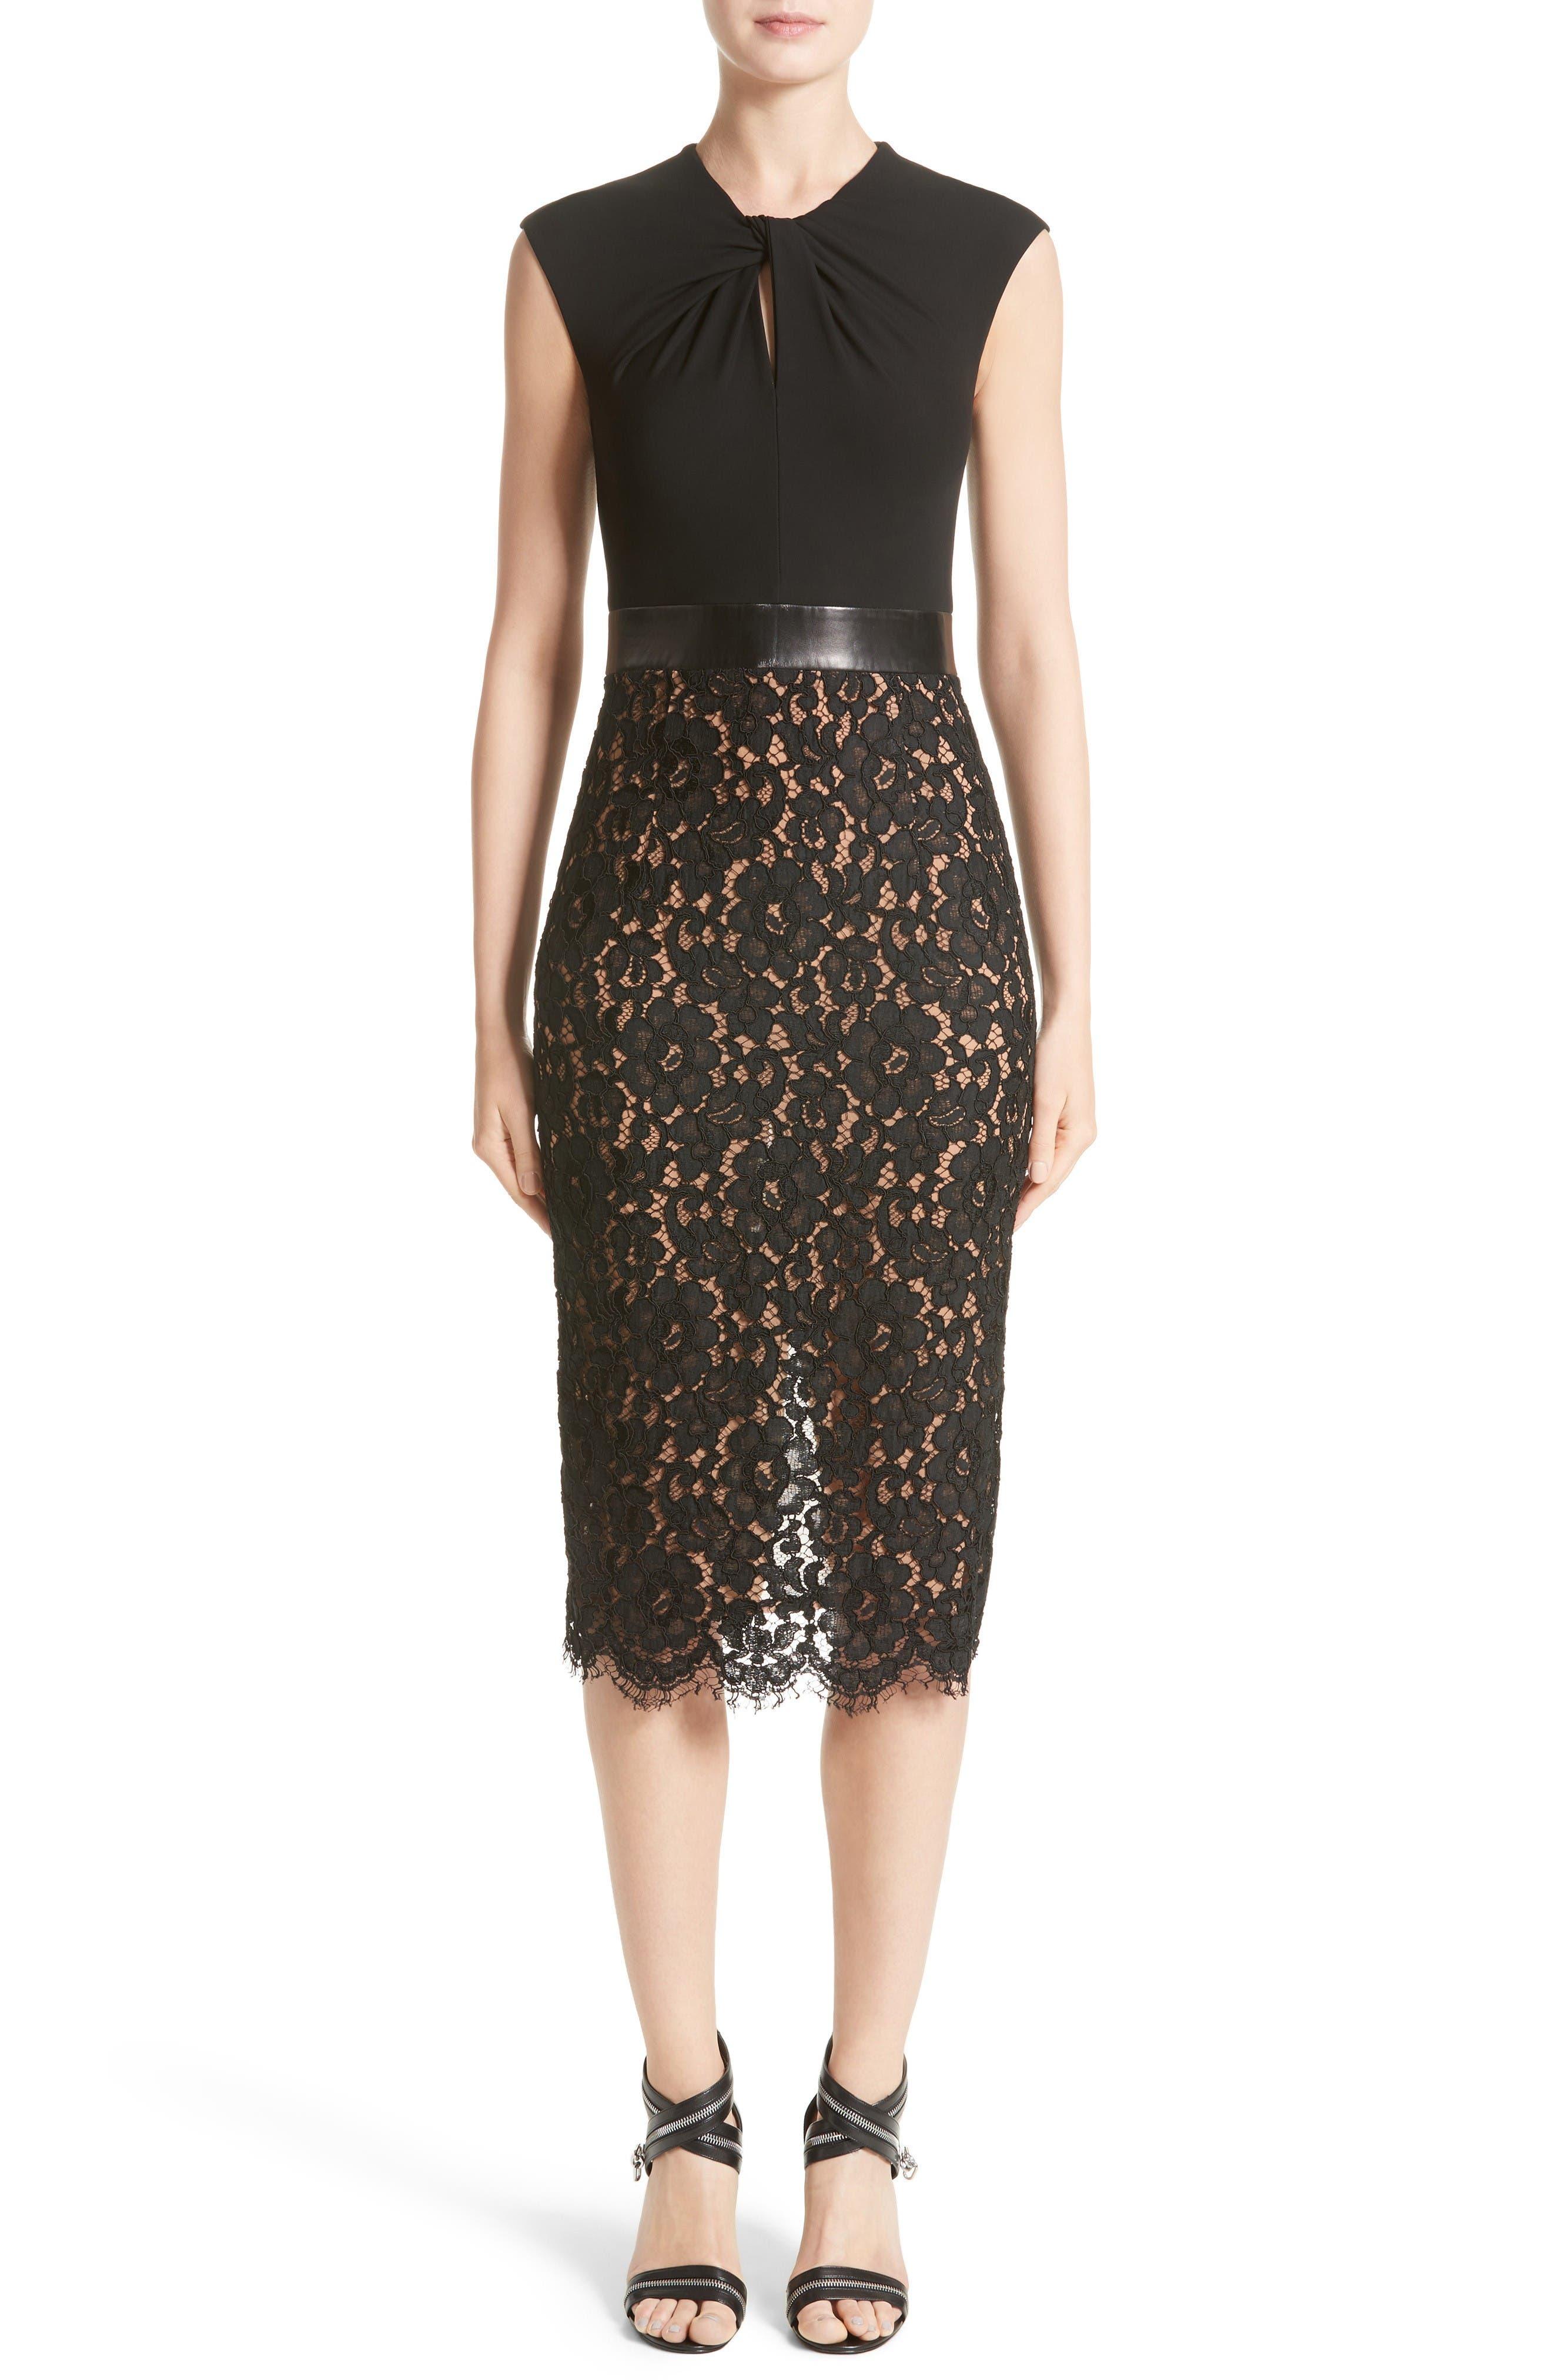 Main Image - Michael Kors Leather Trim Jersey & Lace Sheath Dress